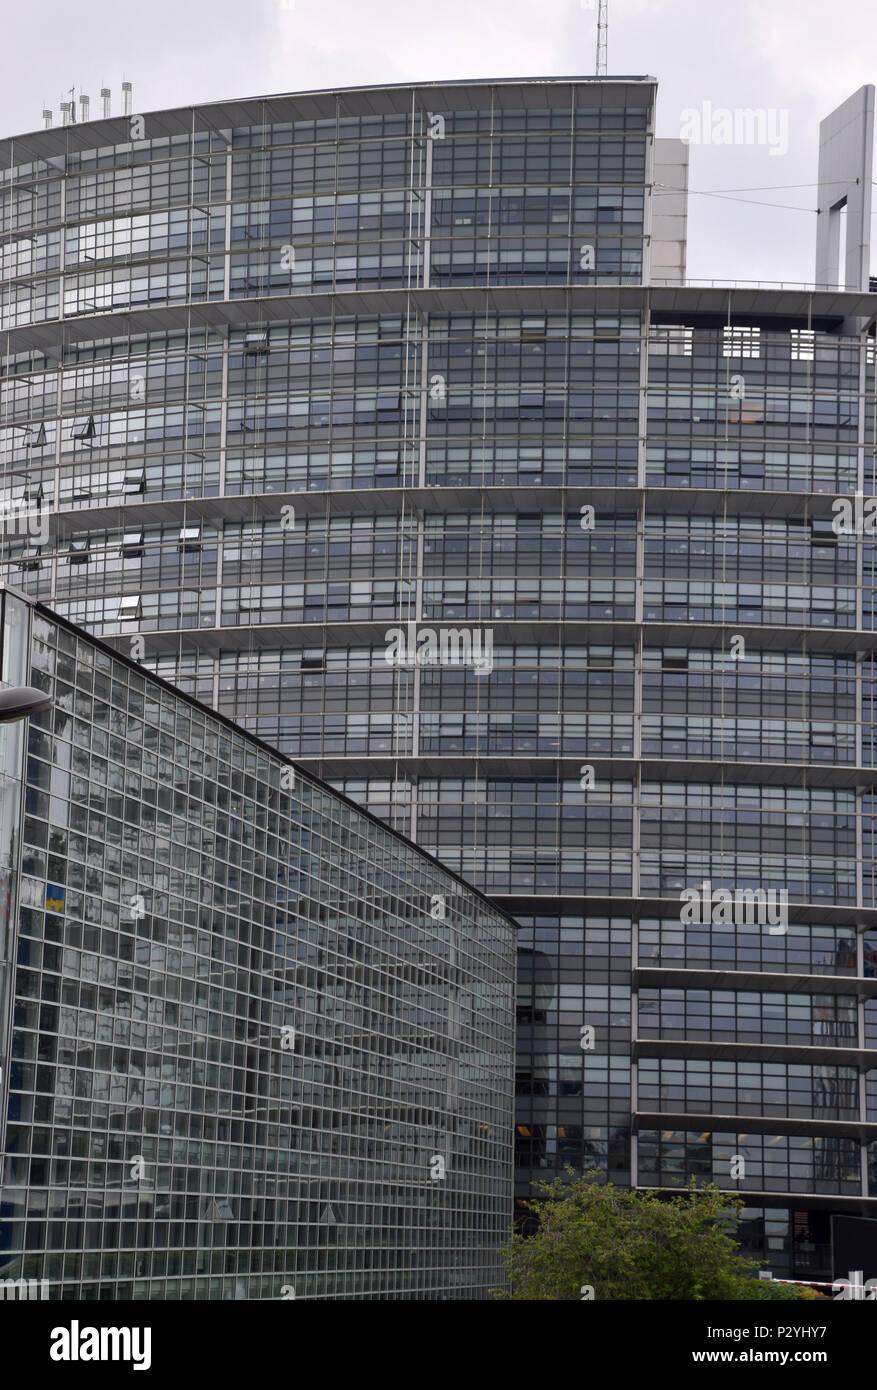 STRASBOURG, BR, FRANCE - JUNE 13, 2018: Parliament Building in Strasbourg, European Parliament in Strasbourg under overcast sky - Stock Image